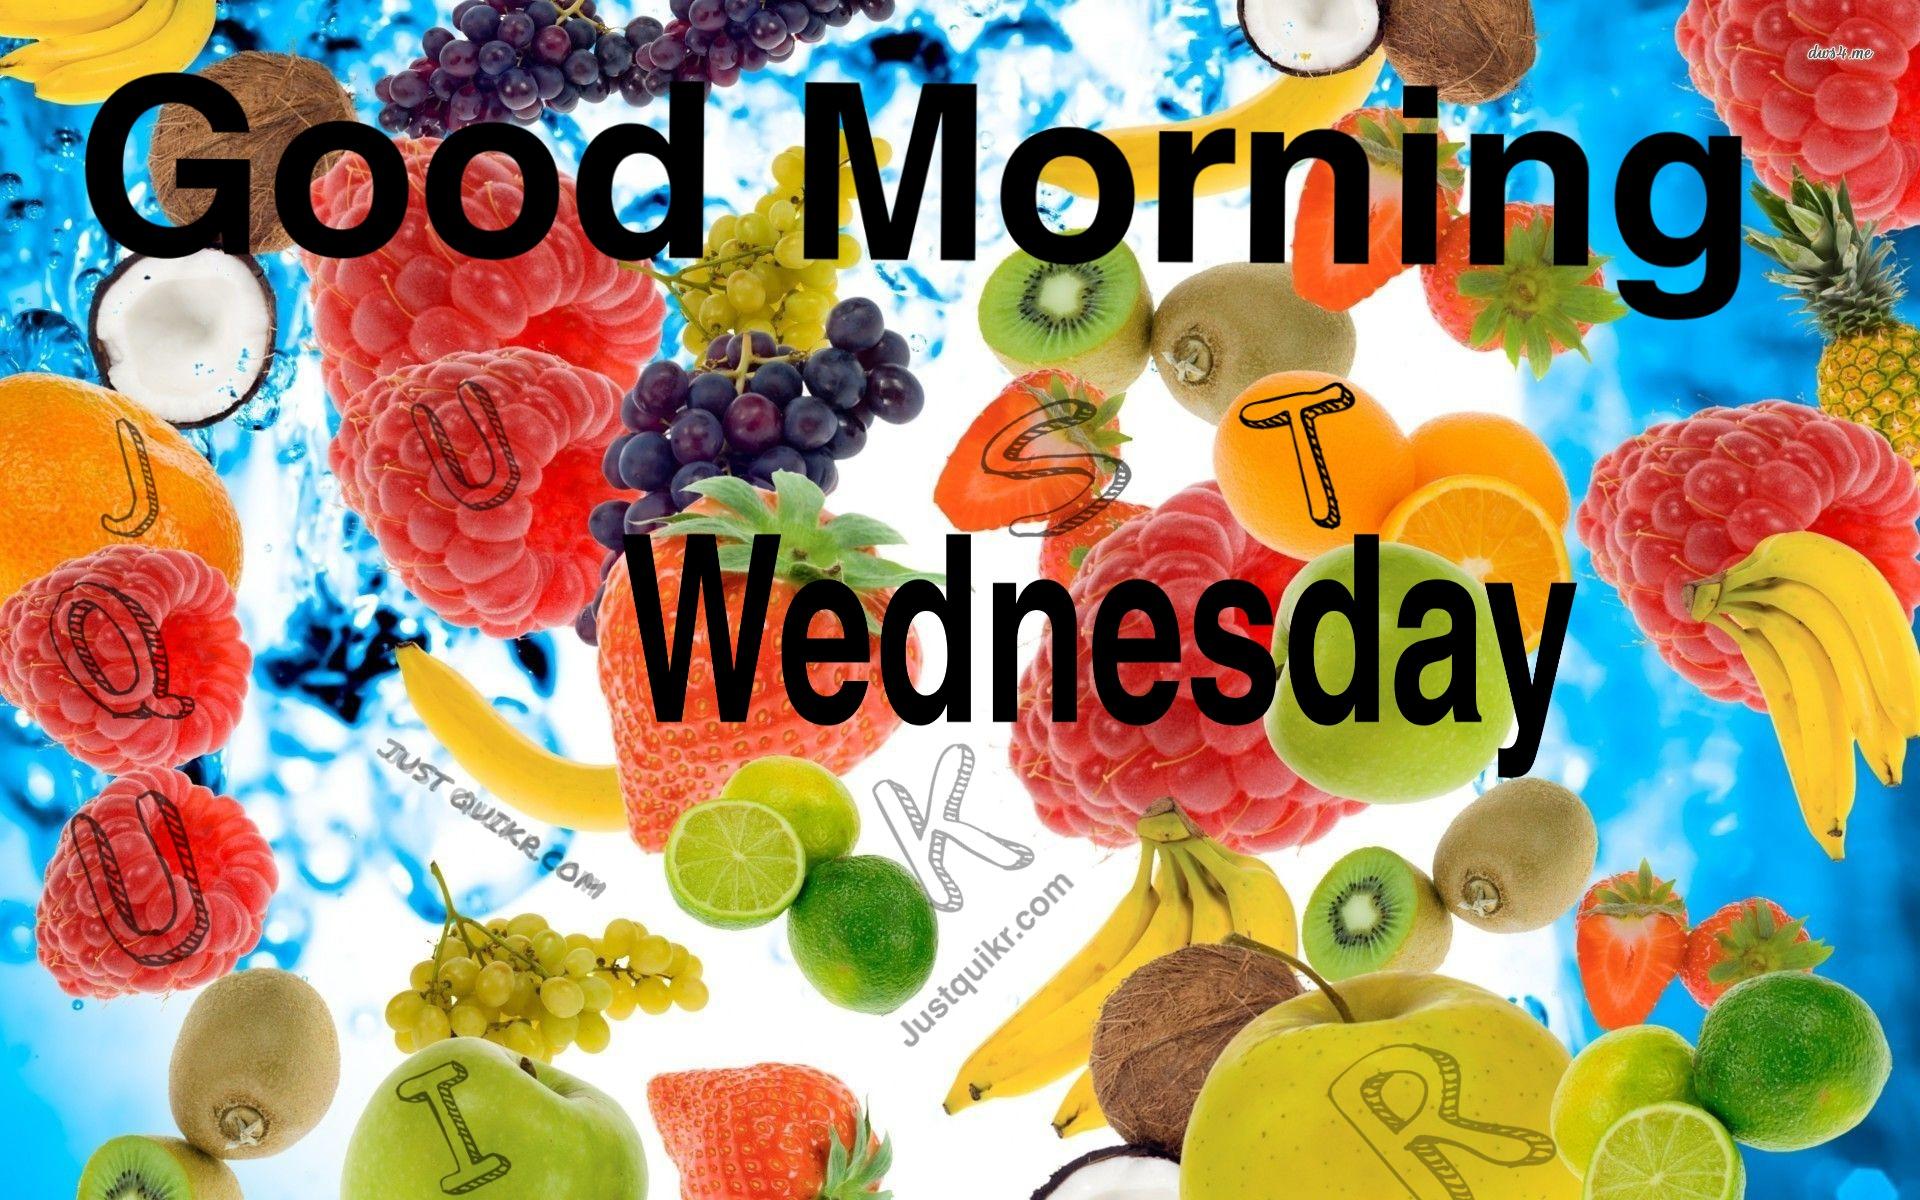 GoodMorning Wednesday Pics Images